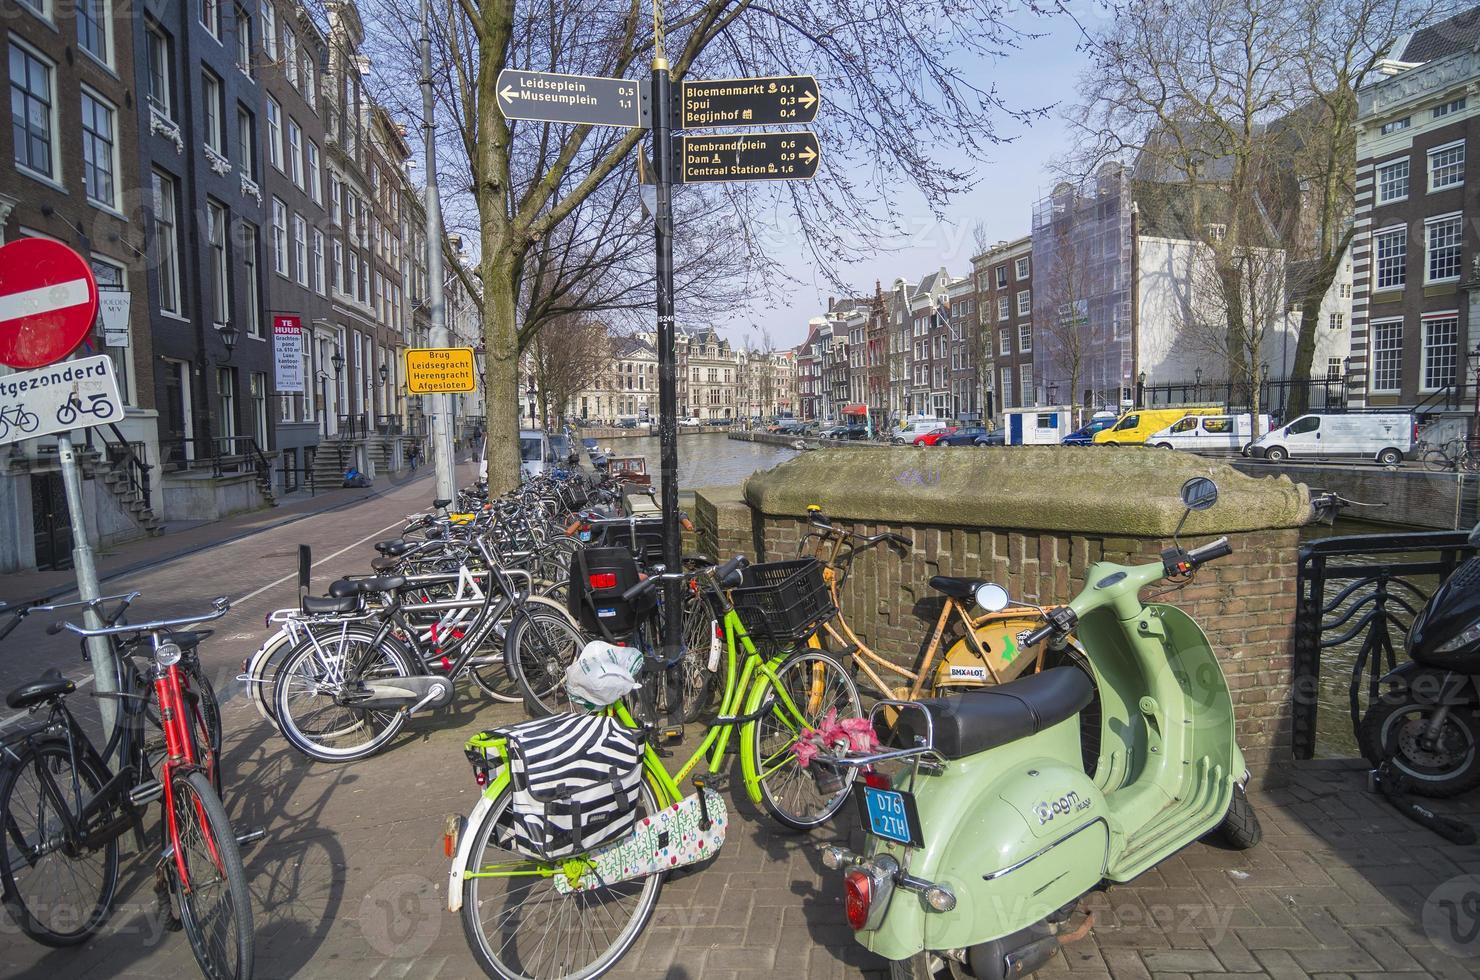 fietsenstalling aan de gracht, amsterdam. foto